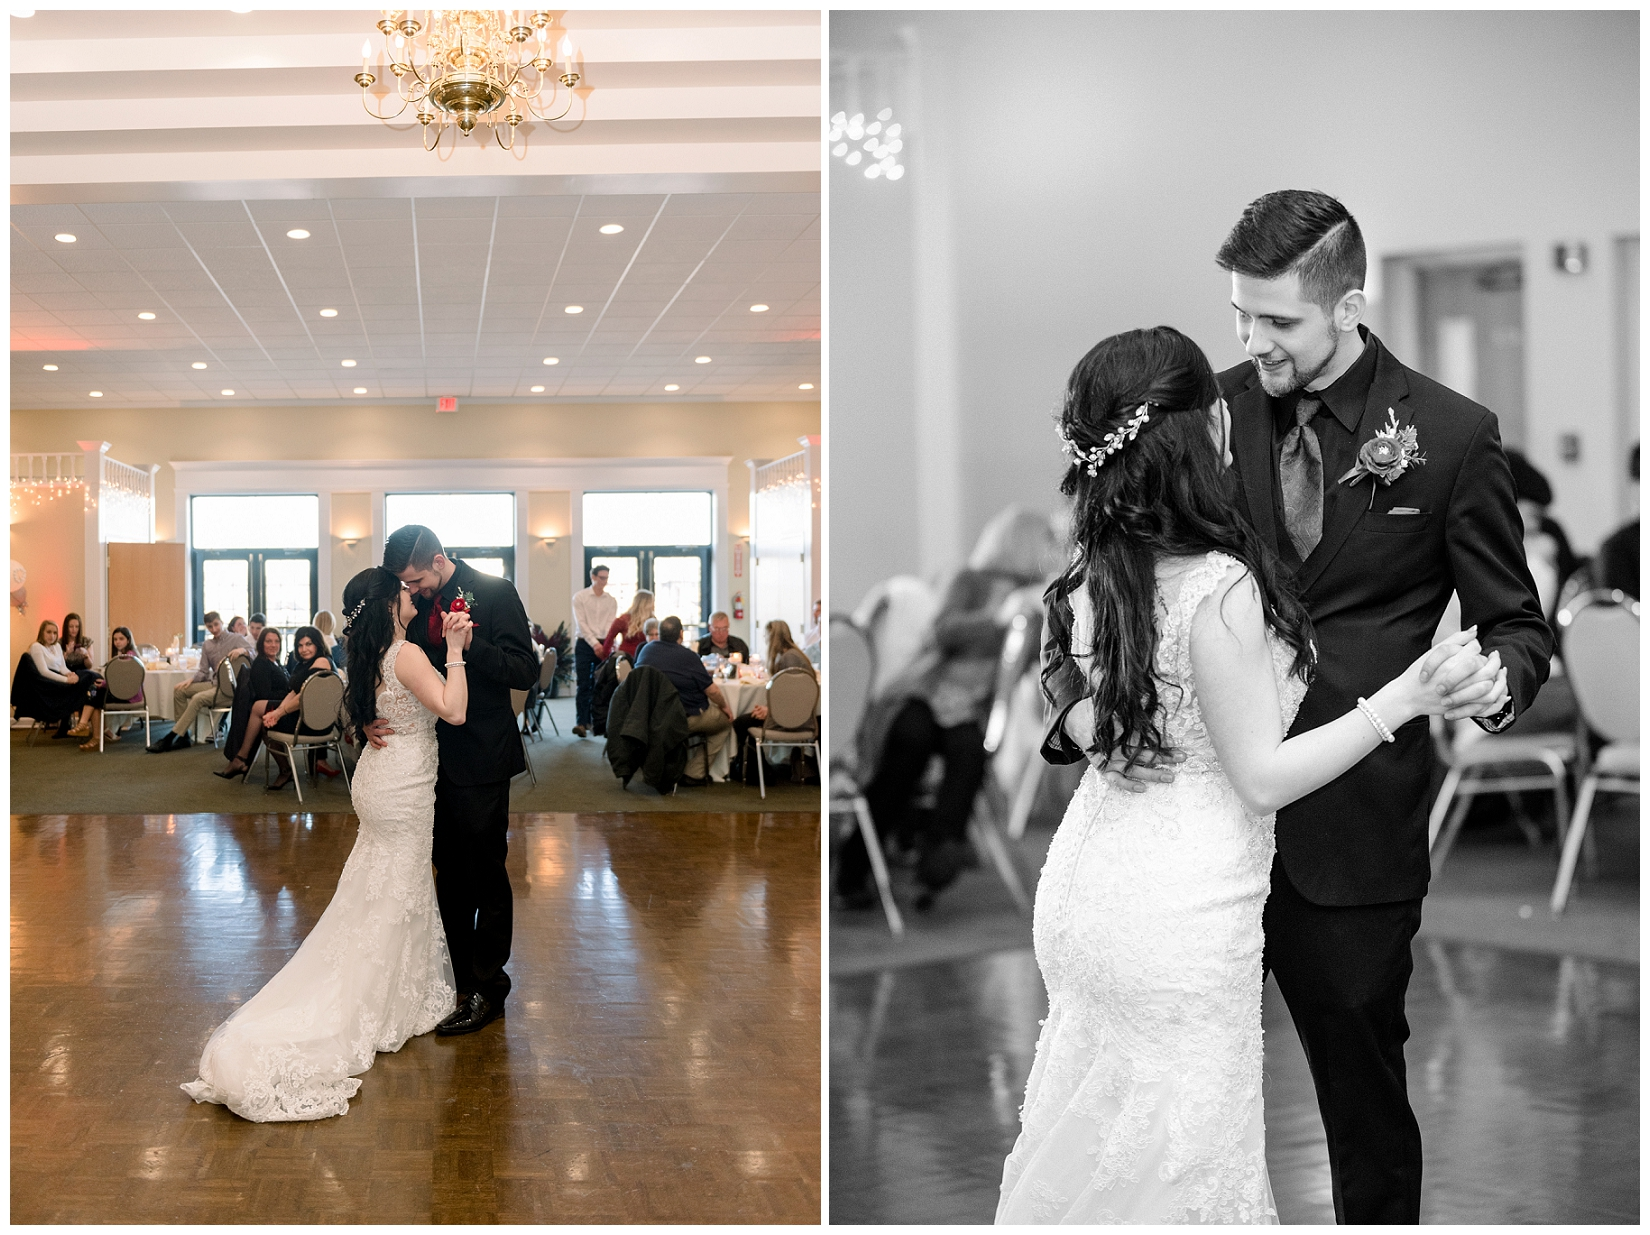 cat-alkire-wedding-photographer-indiana-chicago-indianapolis-fort-wayne_1118.jpg